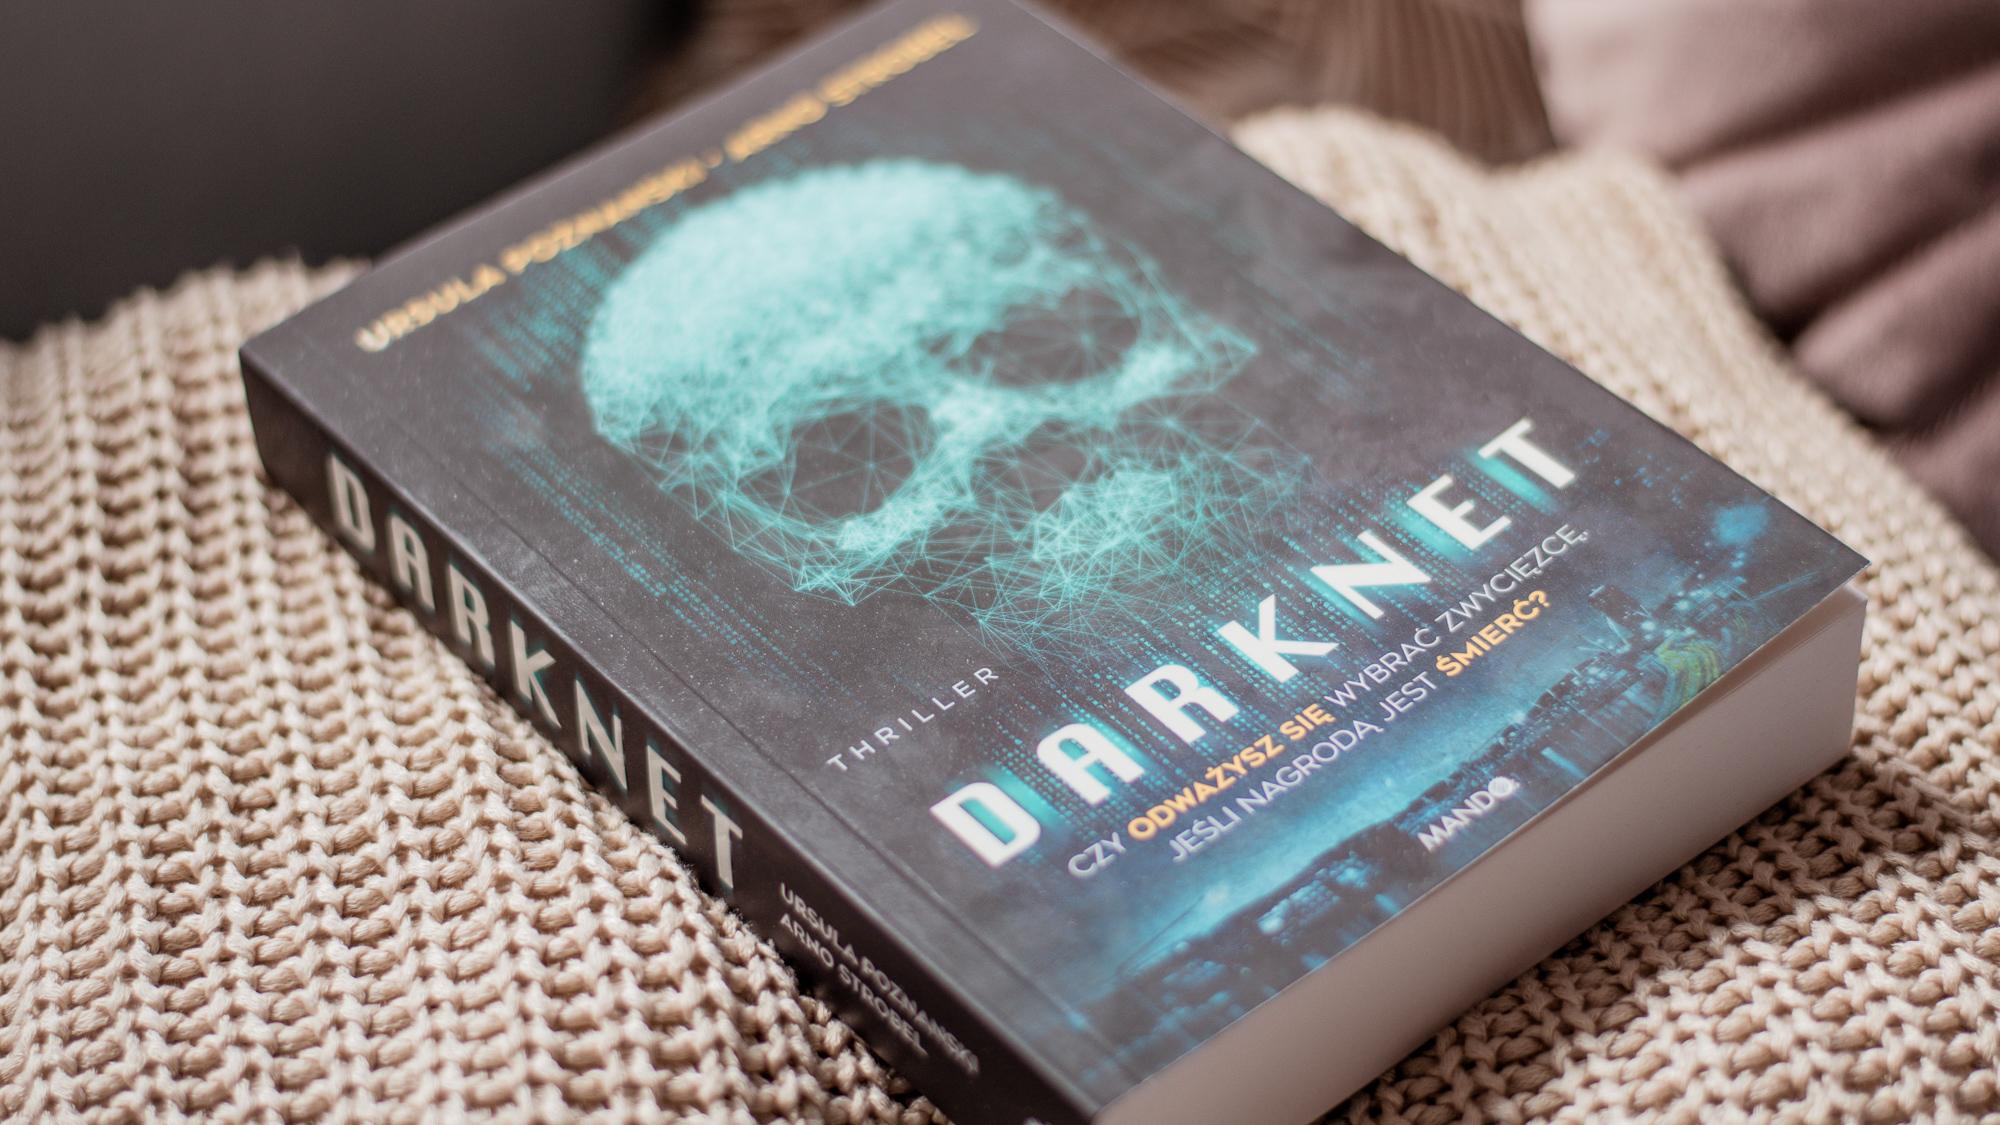 Darknet – Ursula Poznanski, Arno Strobel